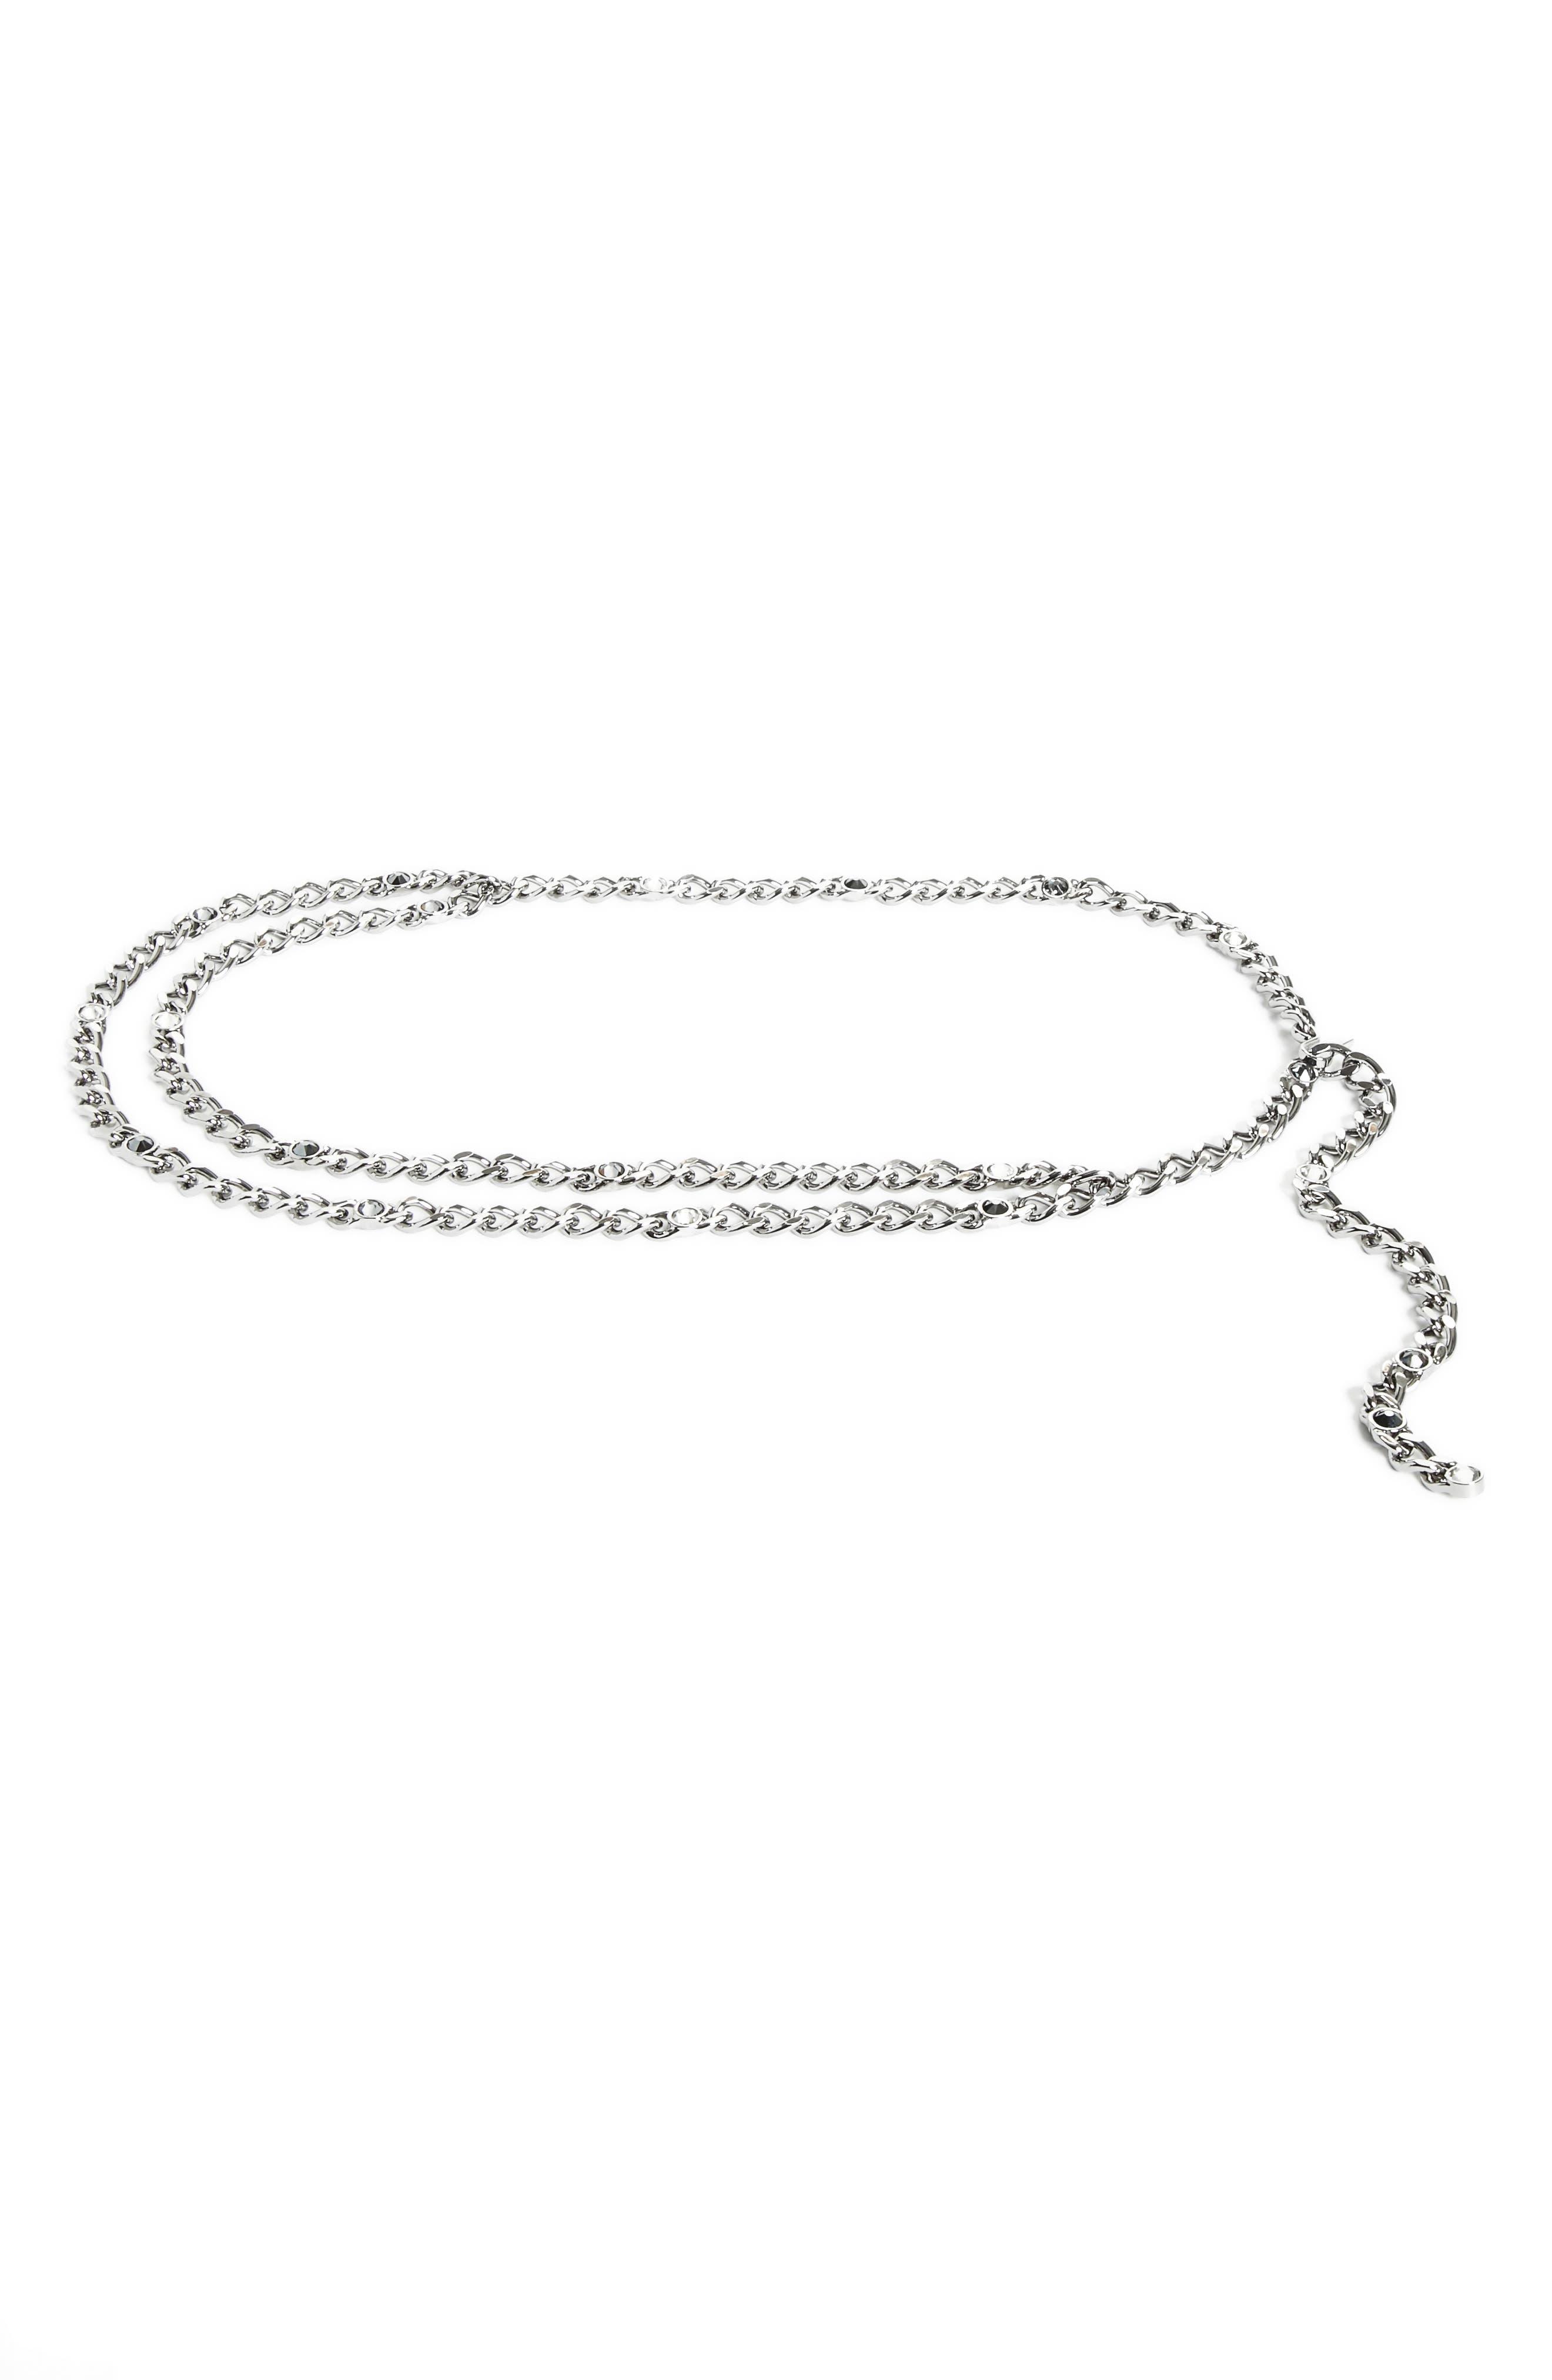 Swarovski Crystal Chain Belt,                             Main thumbnail 1, color,                             Ruthenium Jet Hermatite